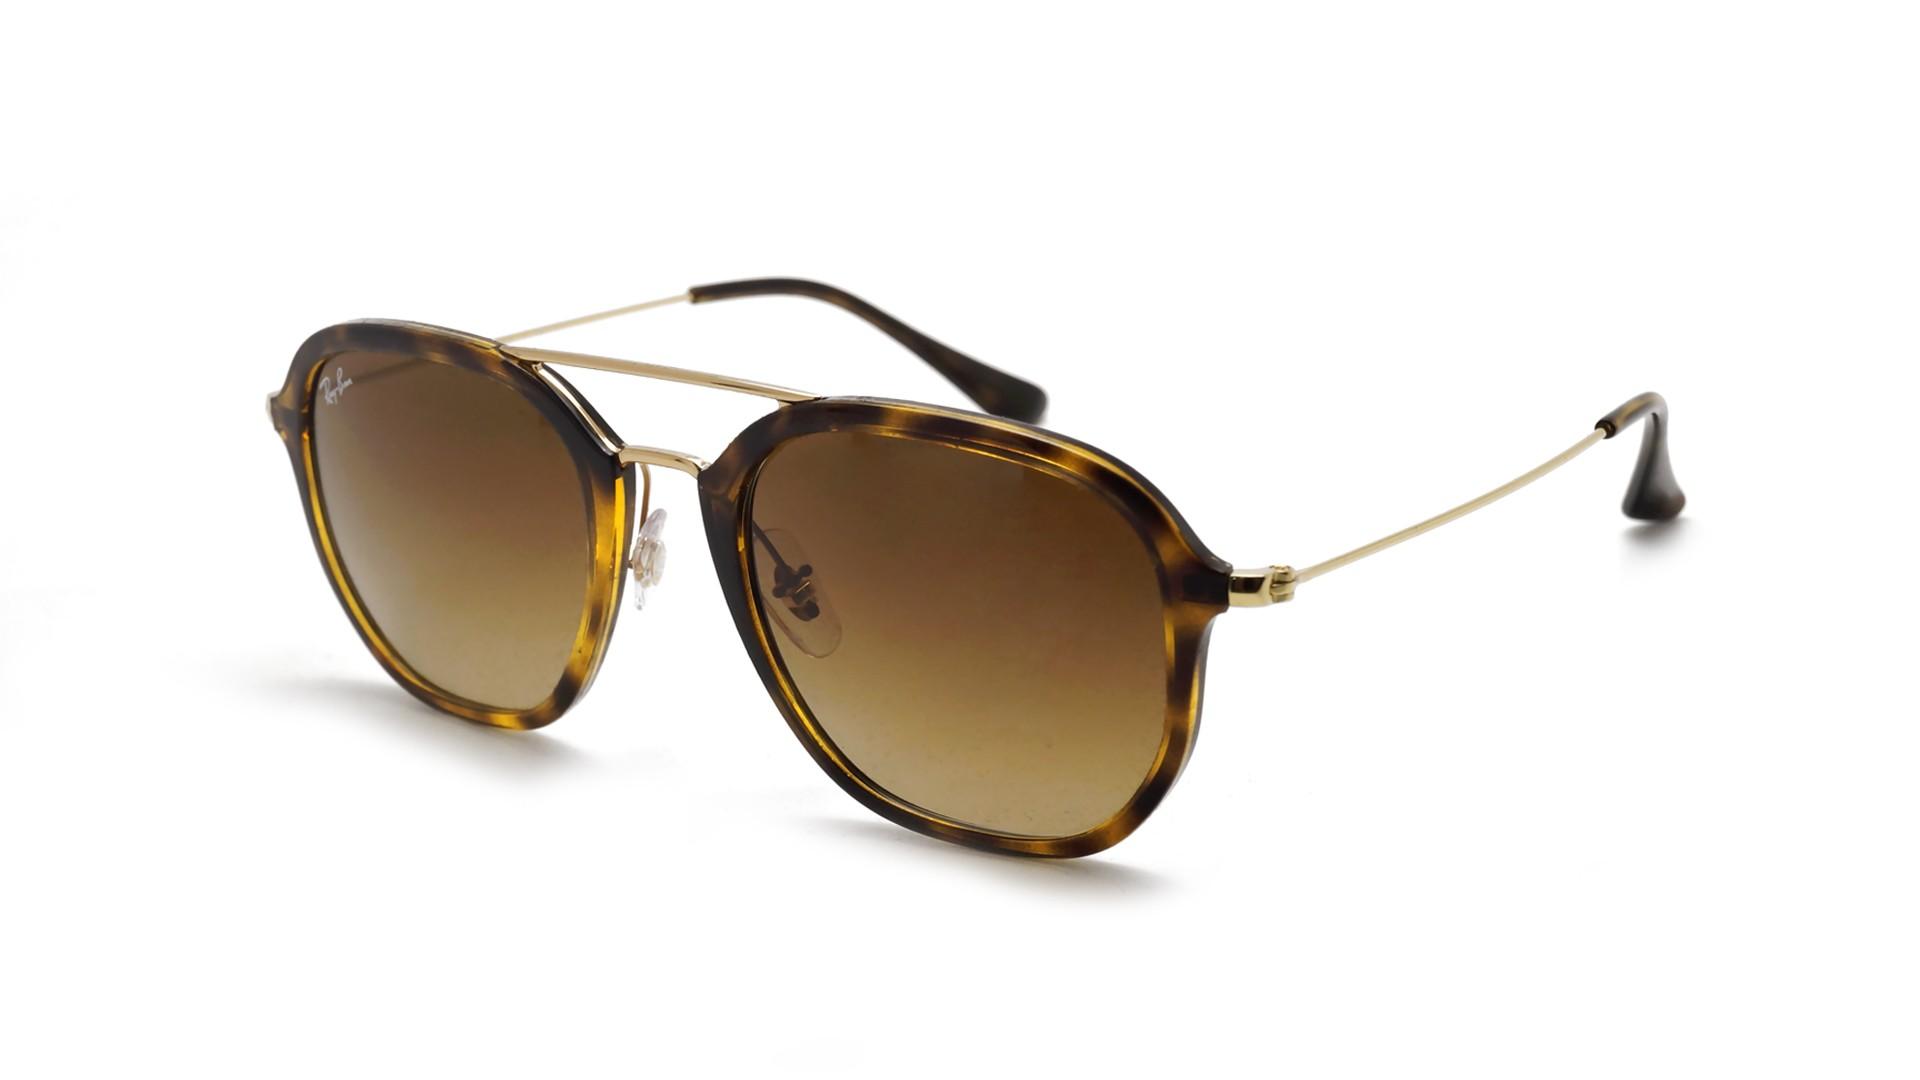 2465e5bc62 Sunglasses Ray-Ban RB4273 710 85 52-21 Tortoise Medium Gradient